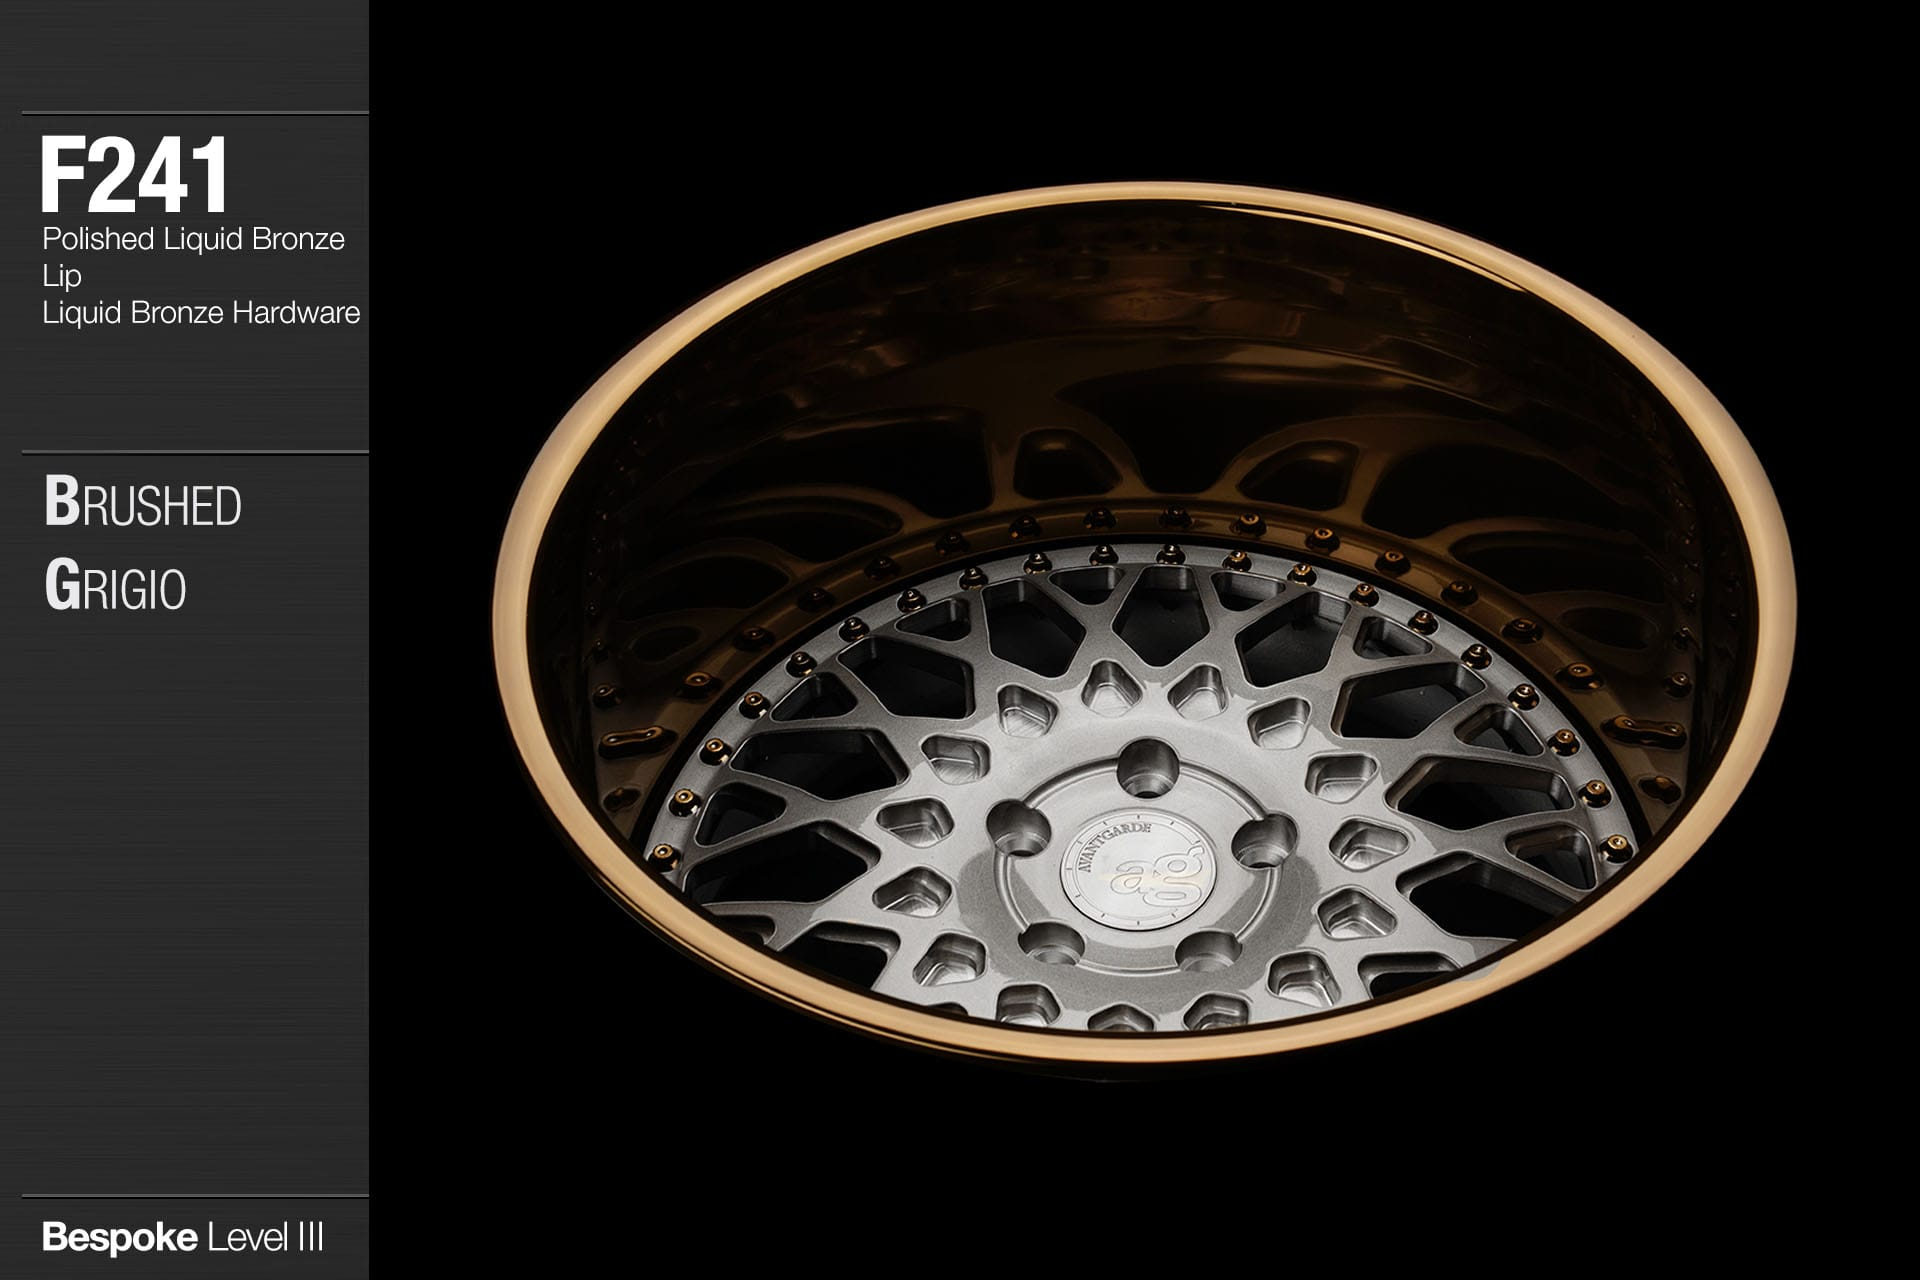 avant-garde-ag-wheels-f241-brushed-grigio-face-polished-liquid-bronze-lip-hardware-3-min